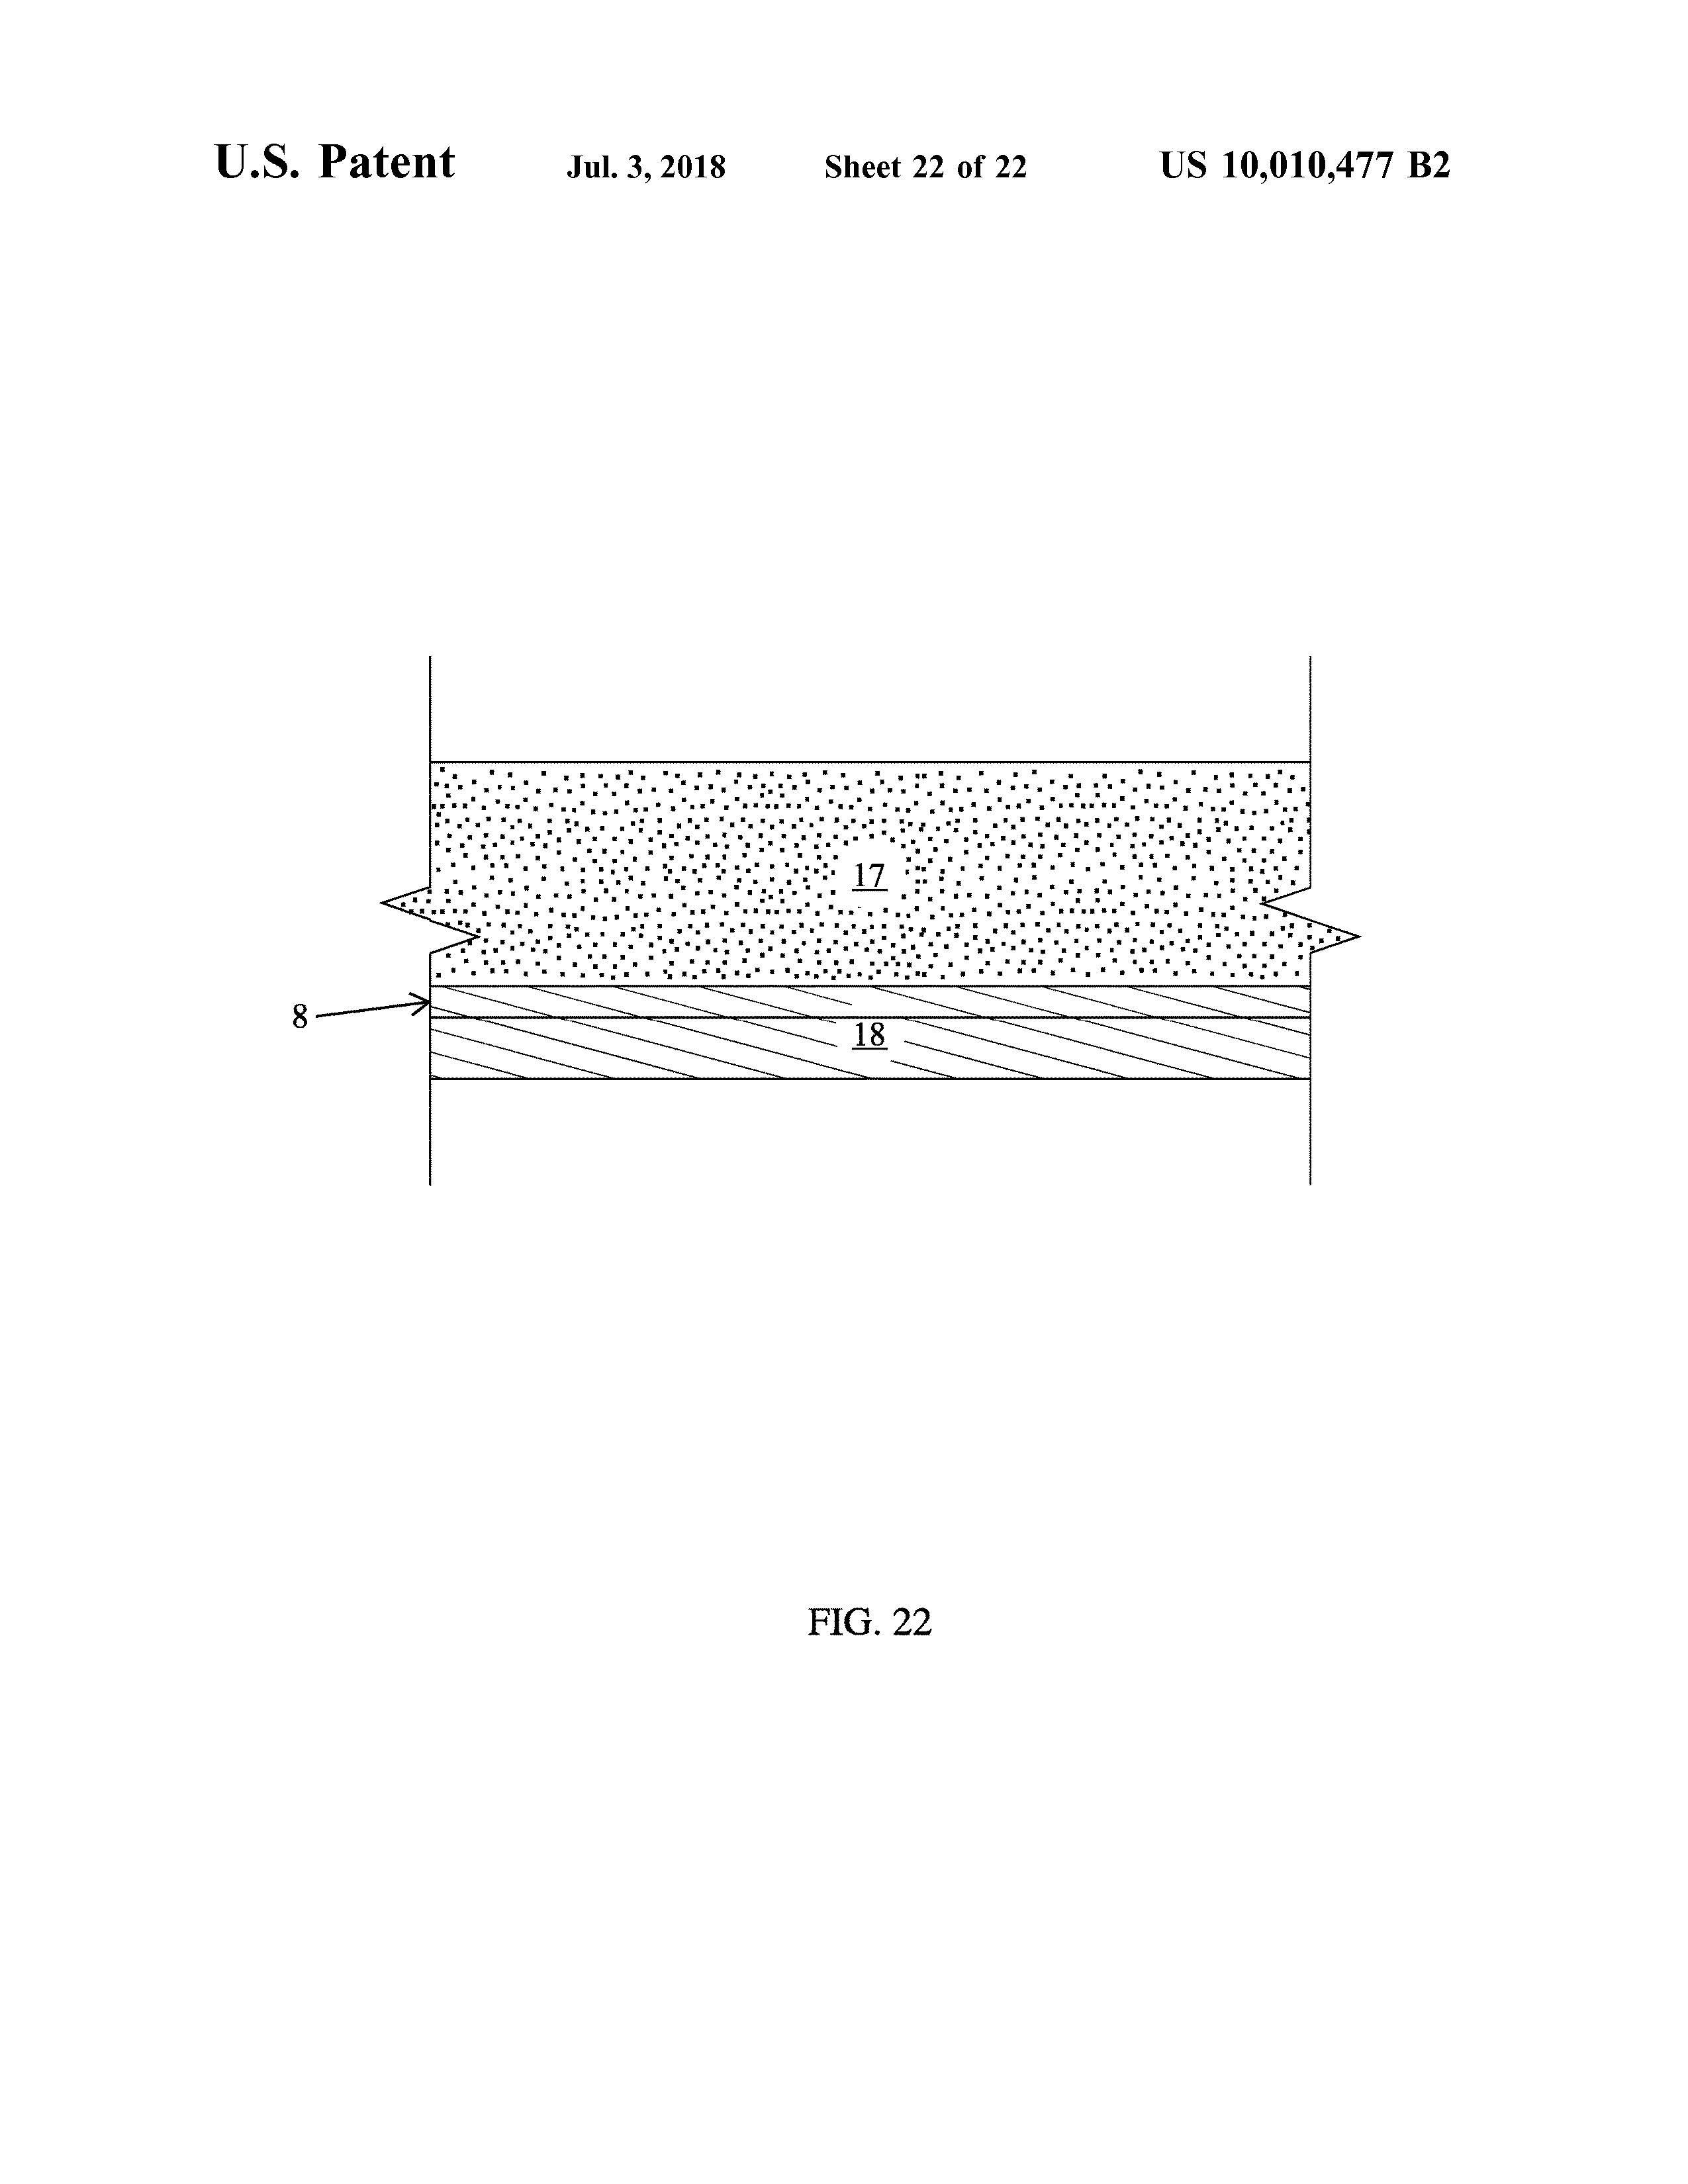 Sauna Tent Patent Page 24